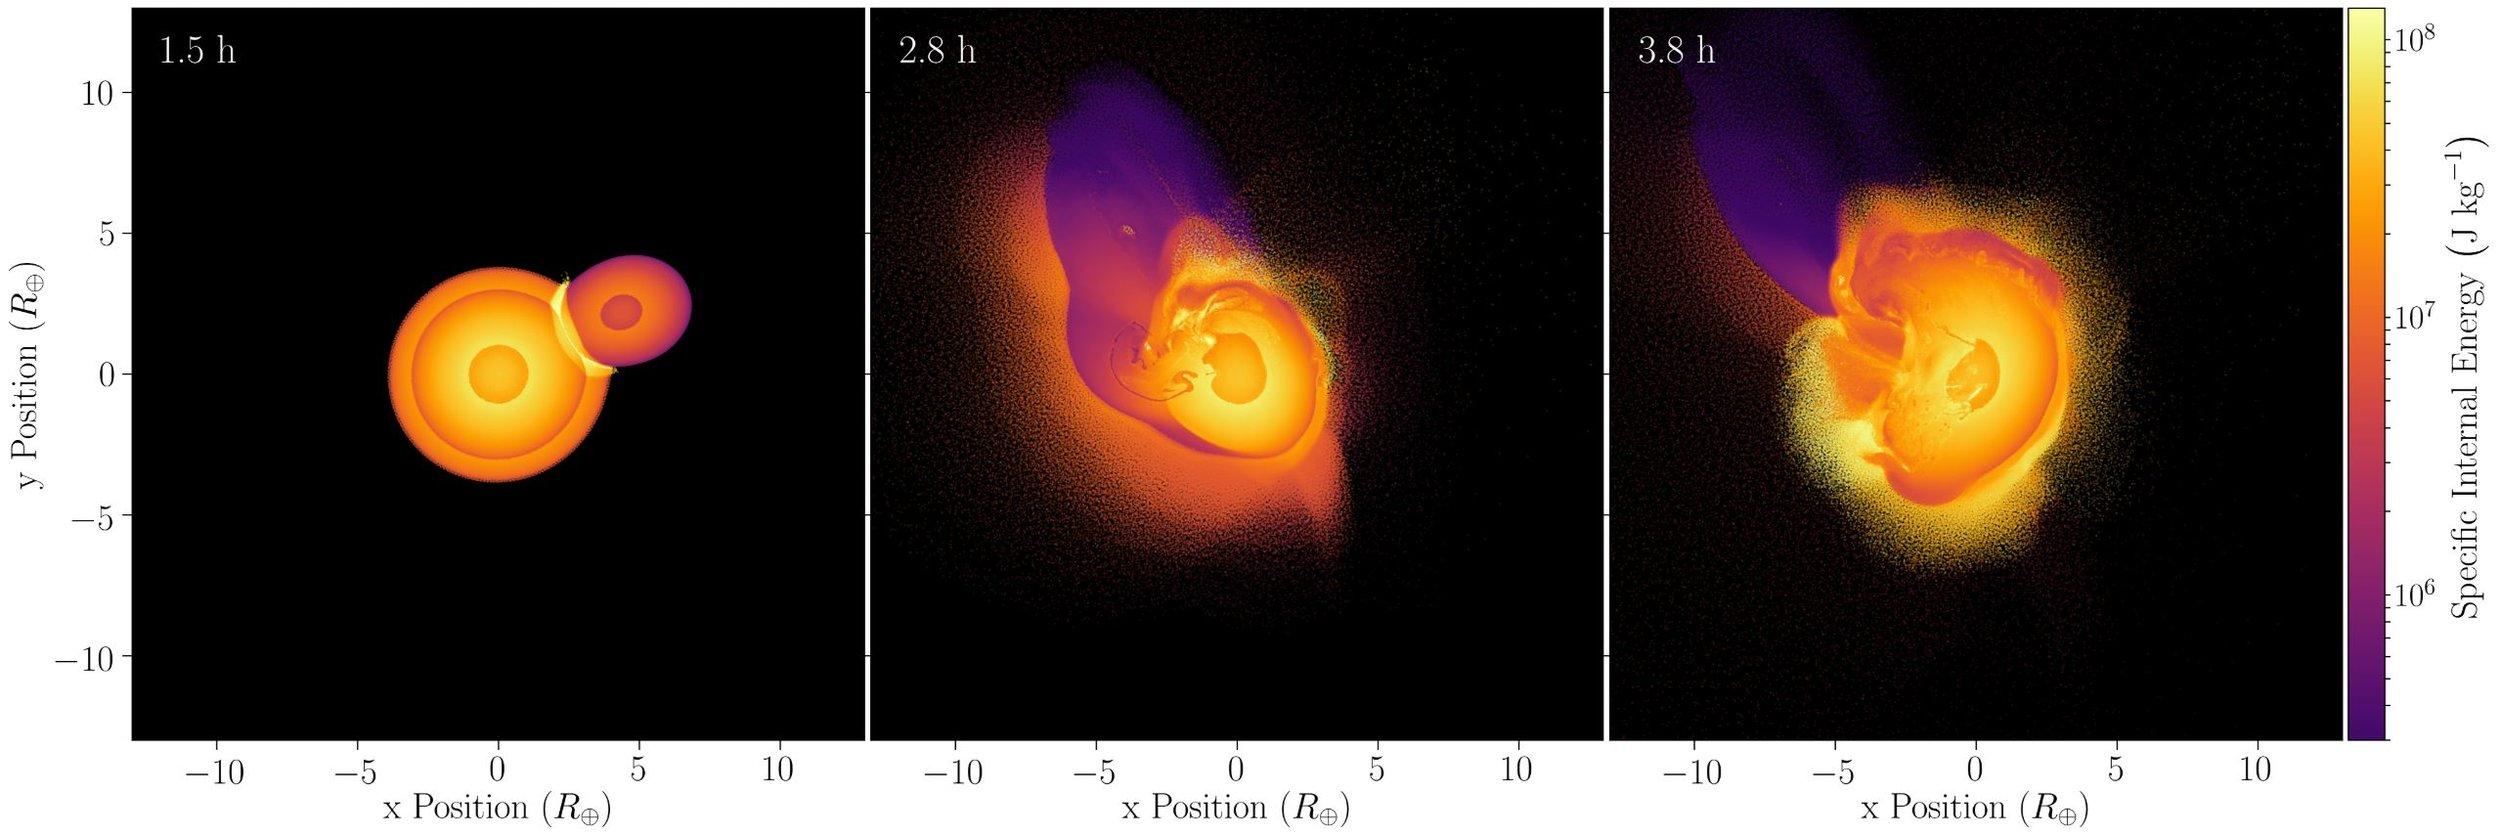 Mid-collision snapshots from the simulation. - Image Credit: Kegerreis et. al., 2018, Durham University.